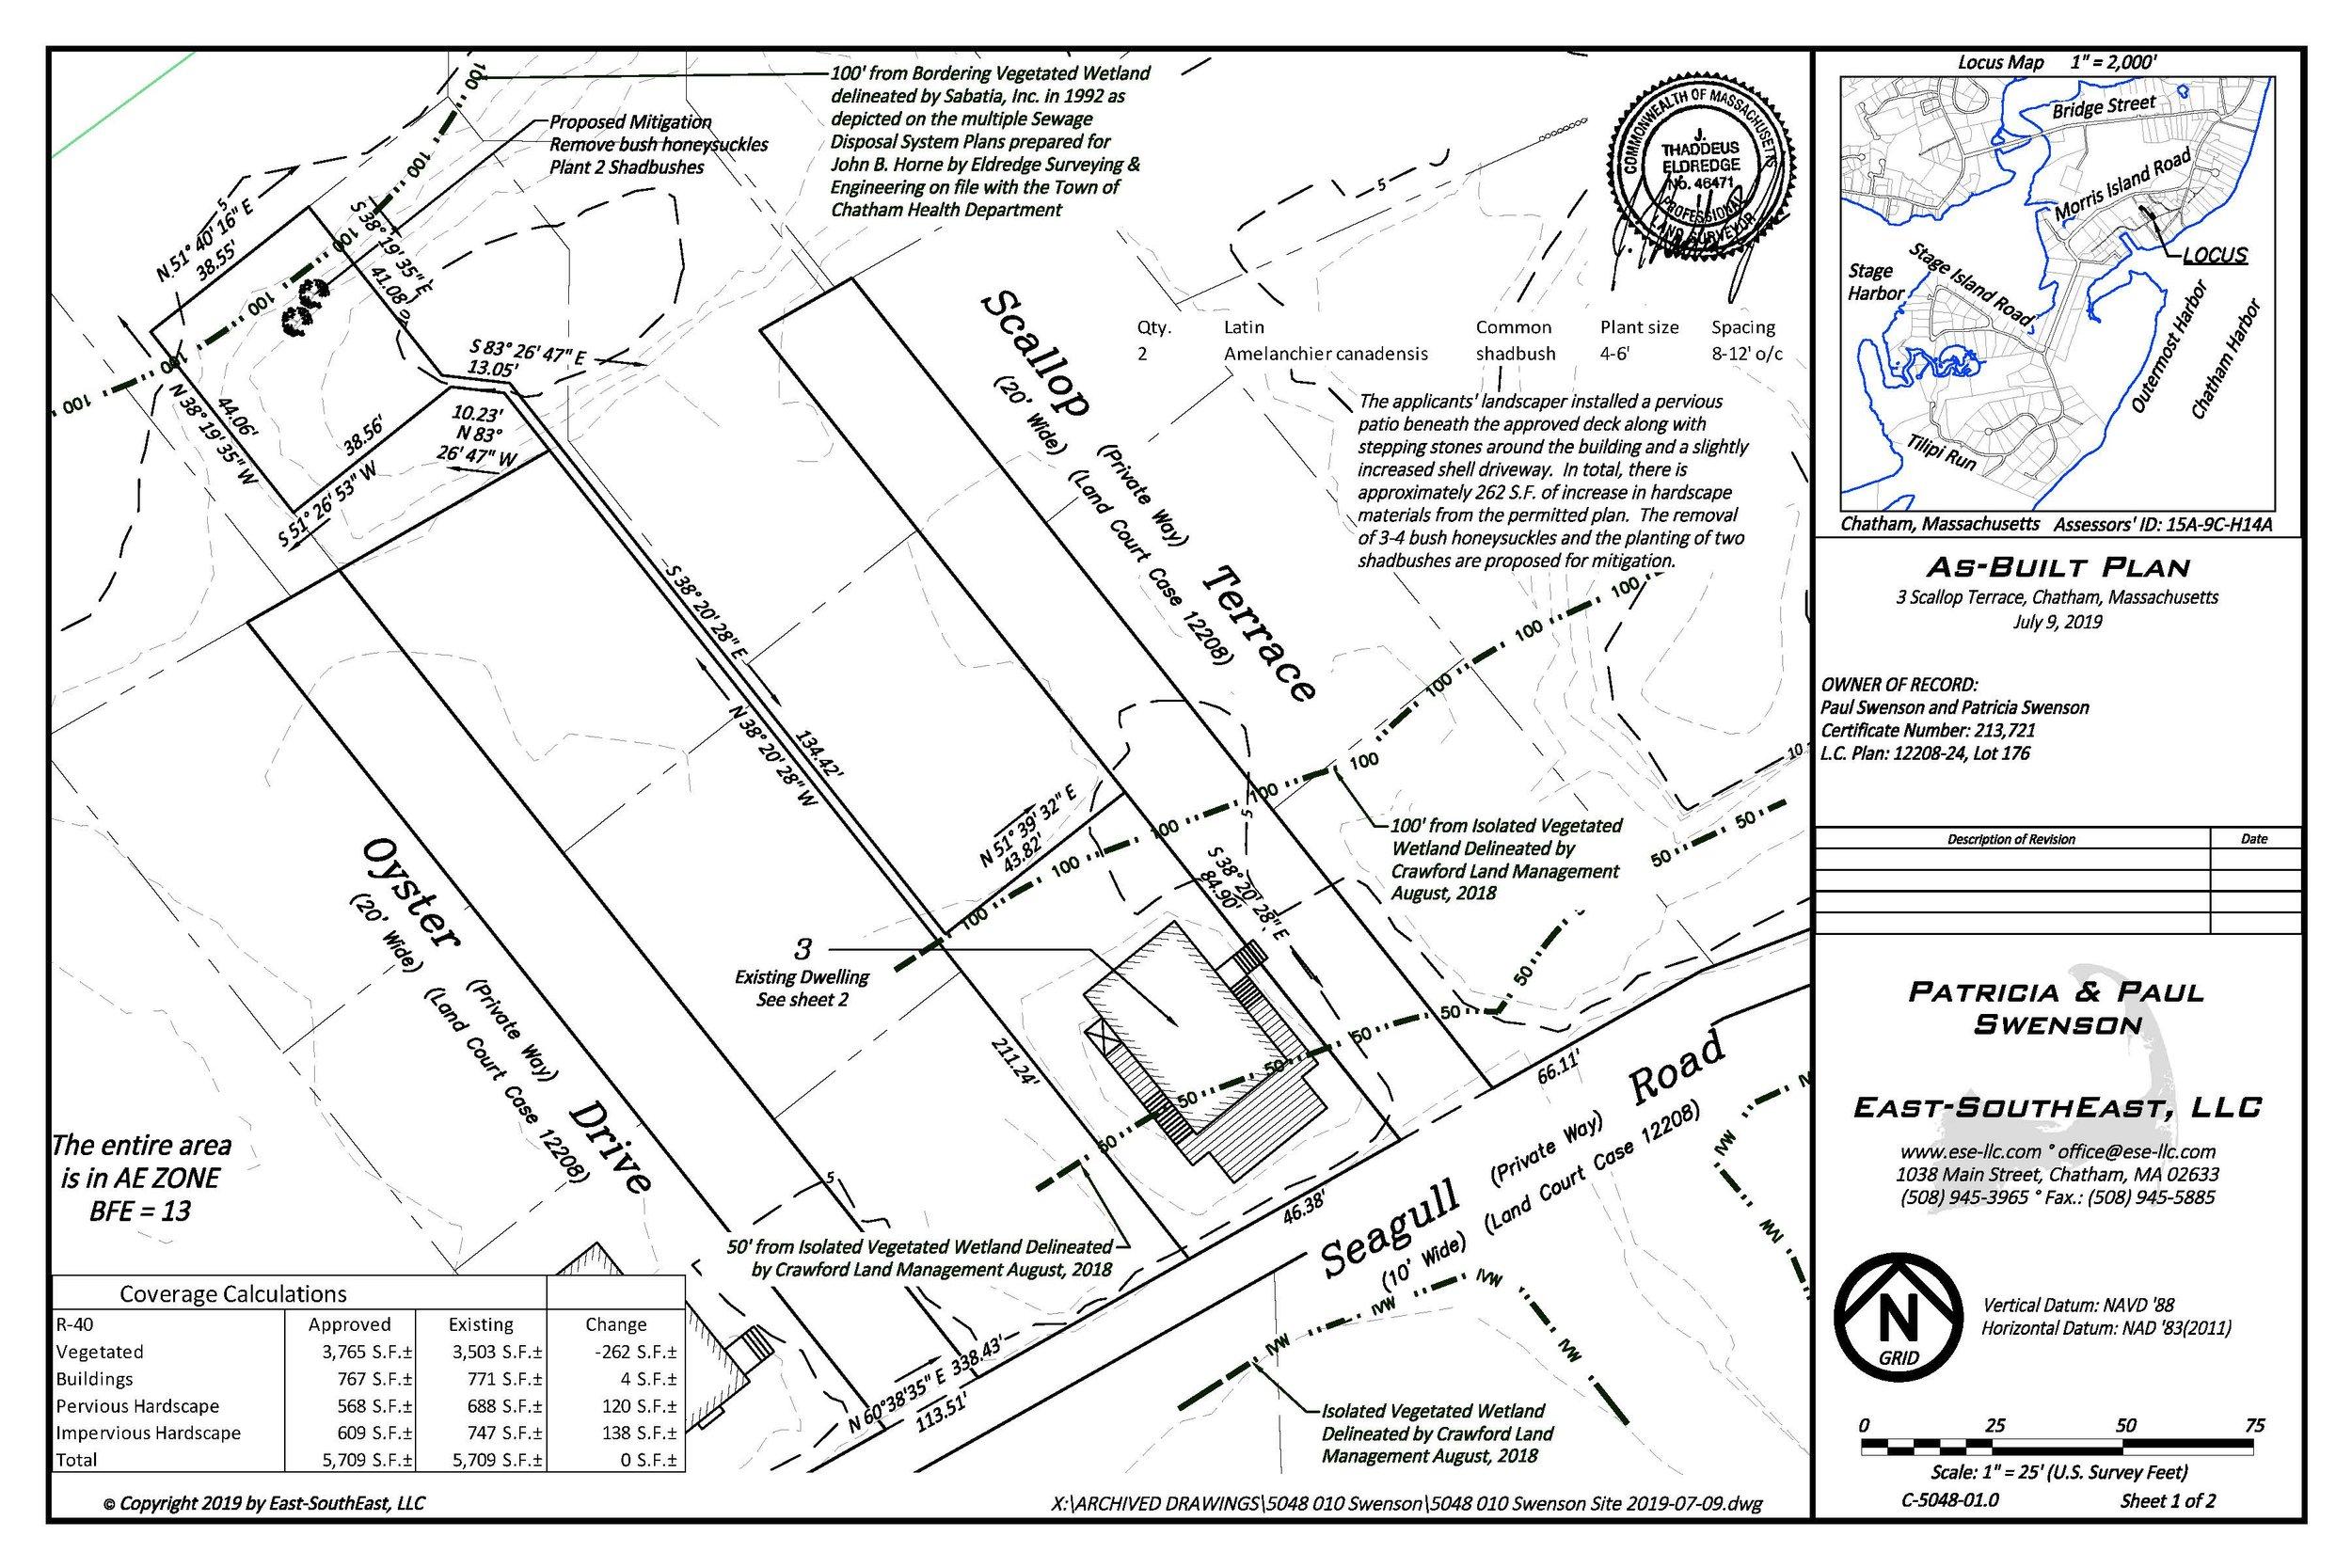 5048 010 Swenson Site 2019-07-09_Page_1.jpg